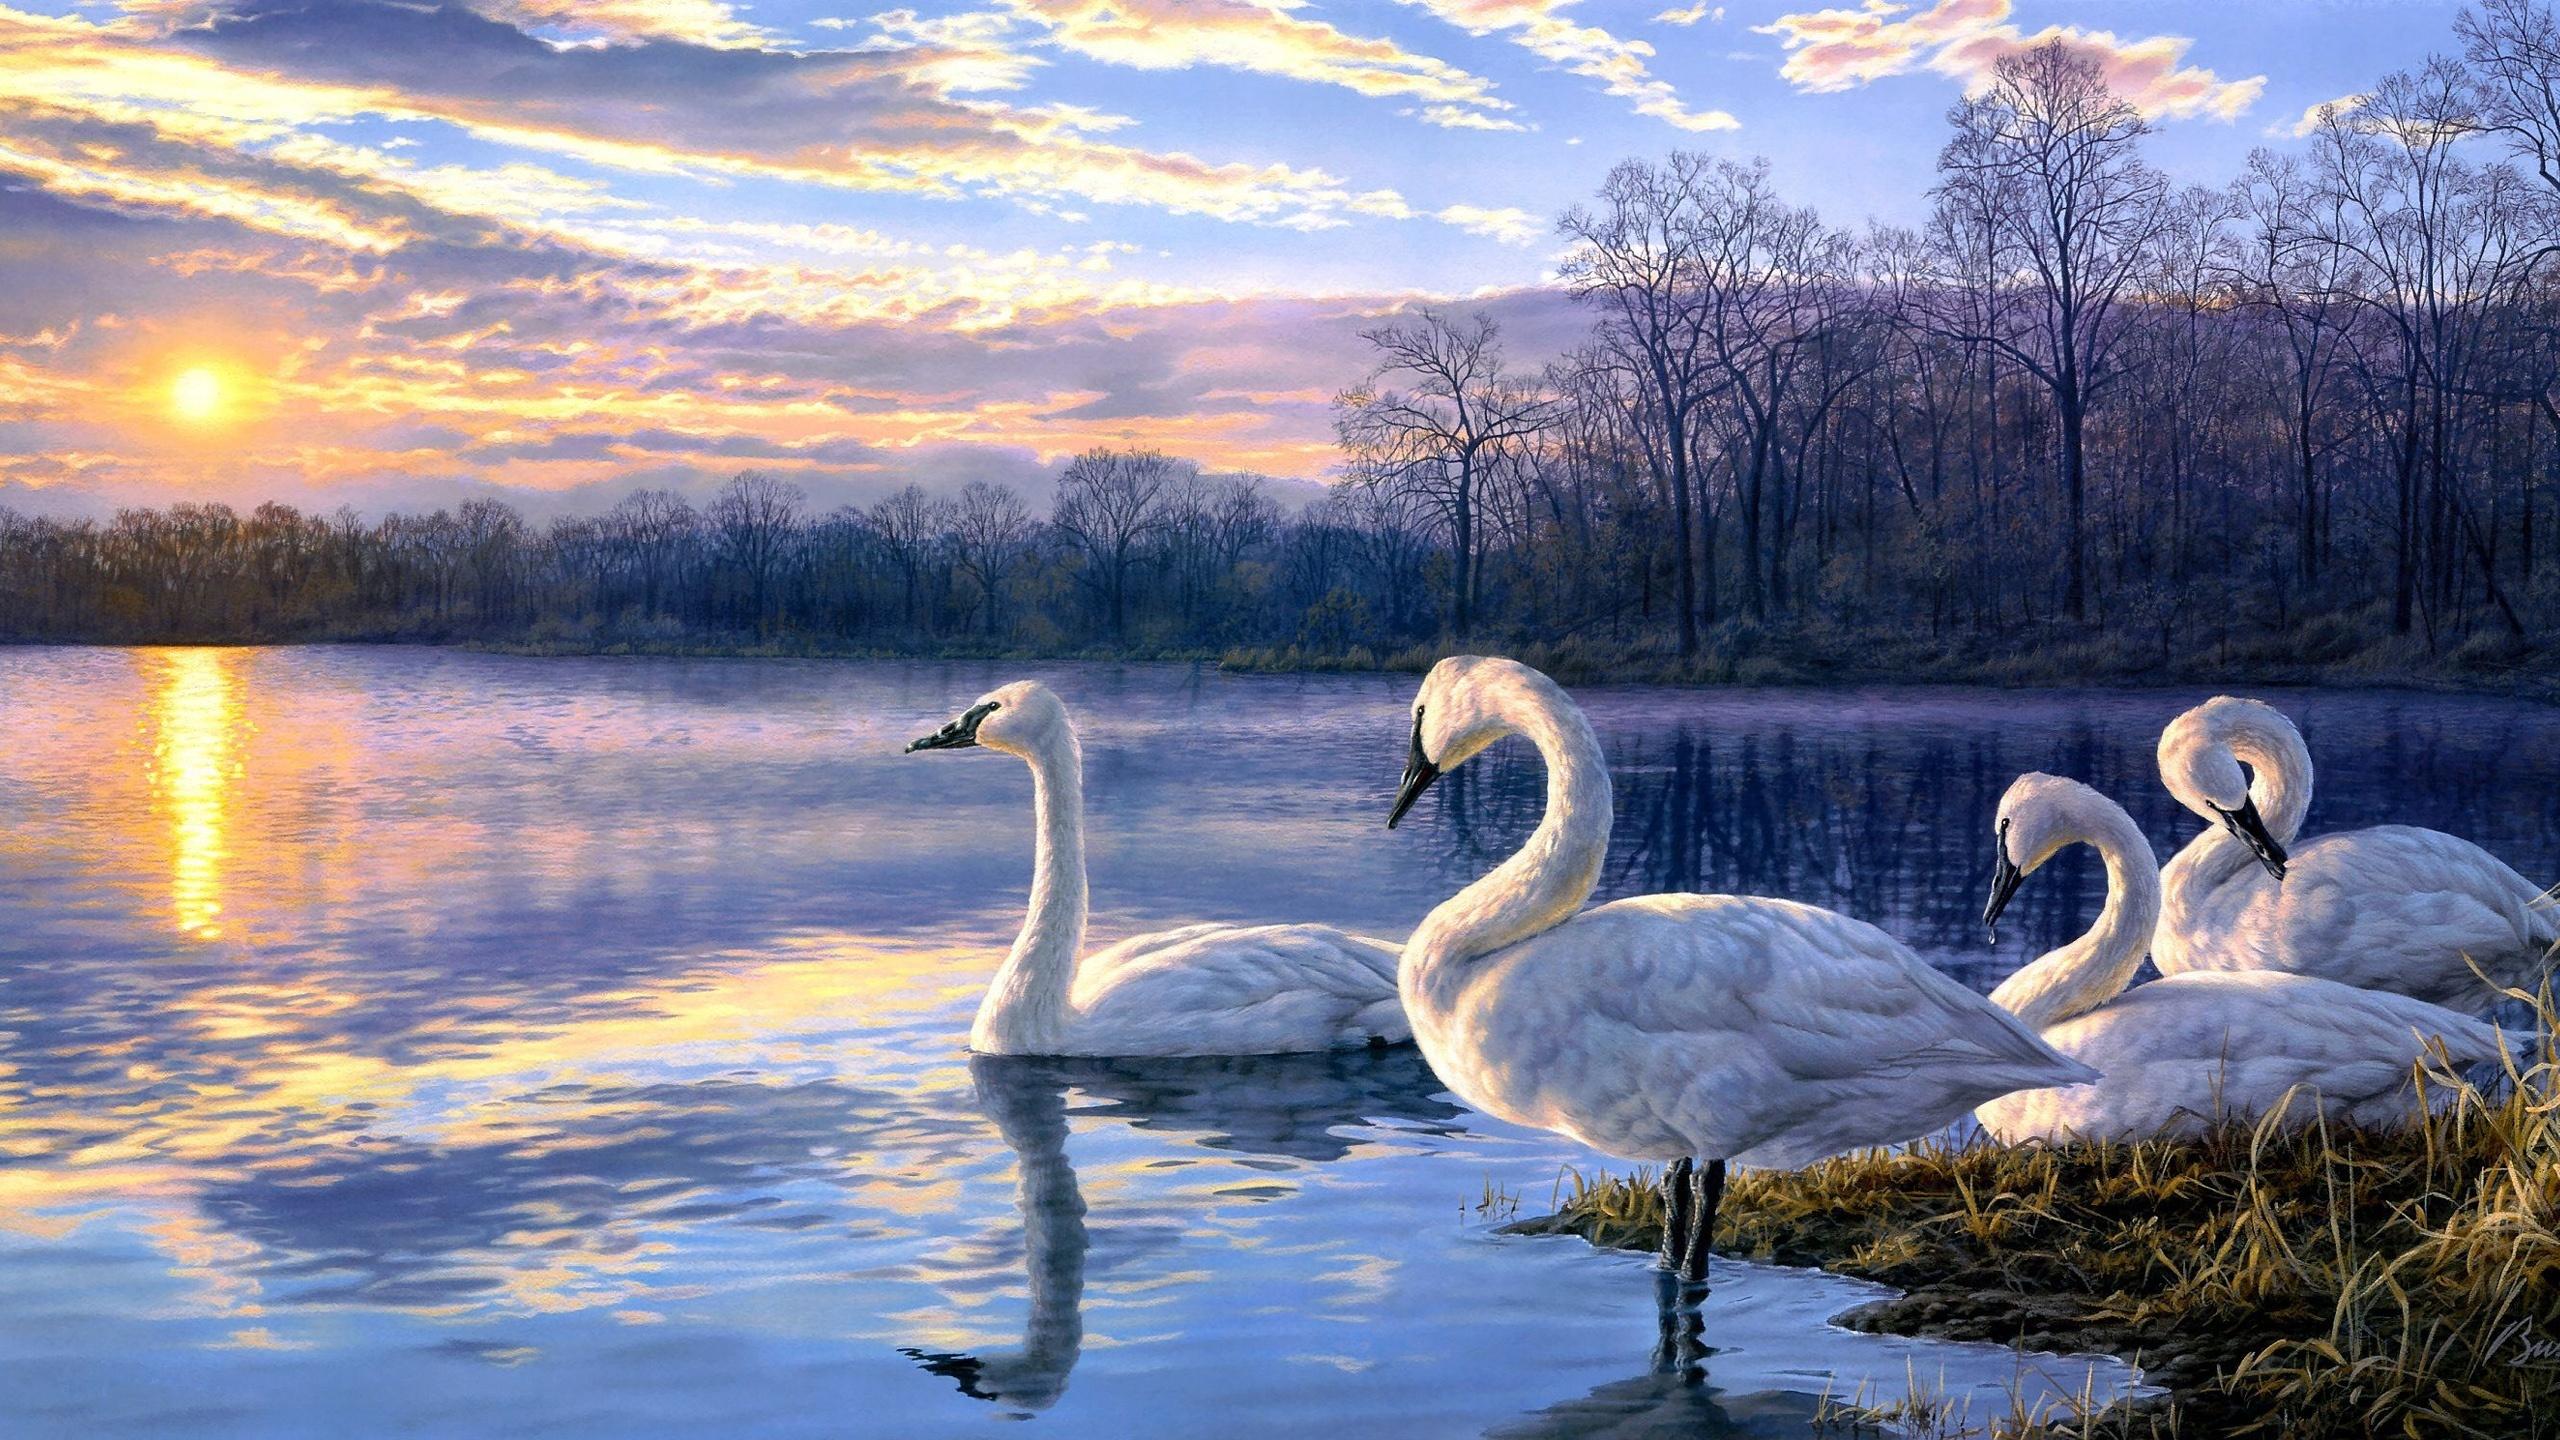 Картинки животных на фоне пейзажа